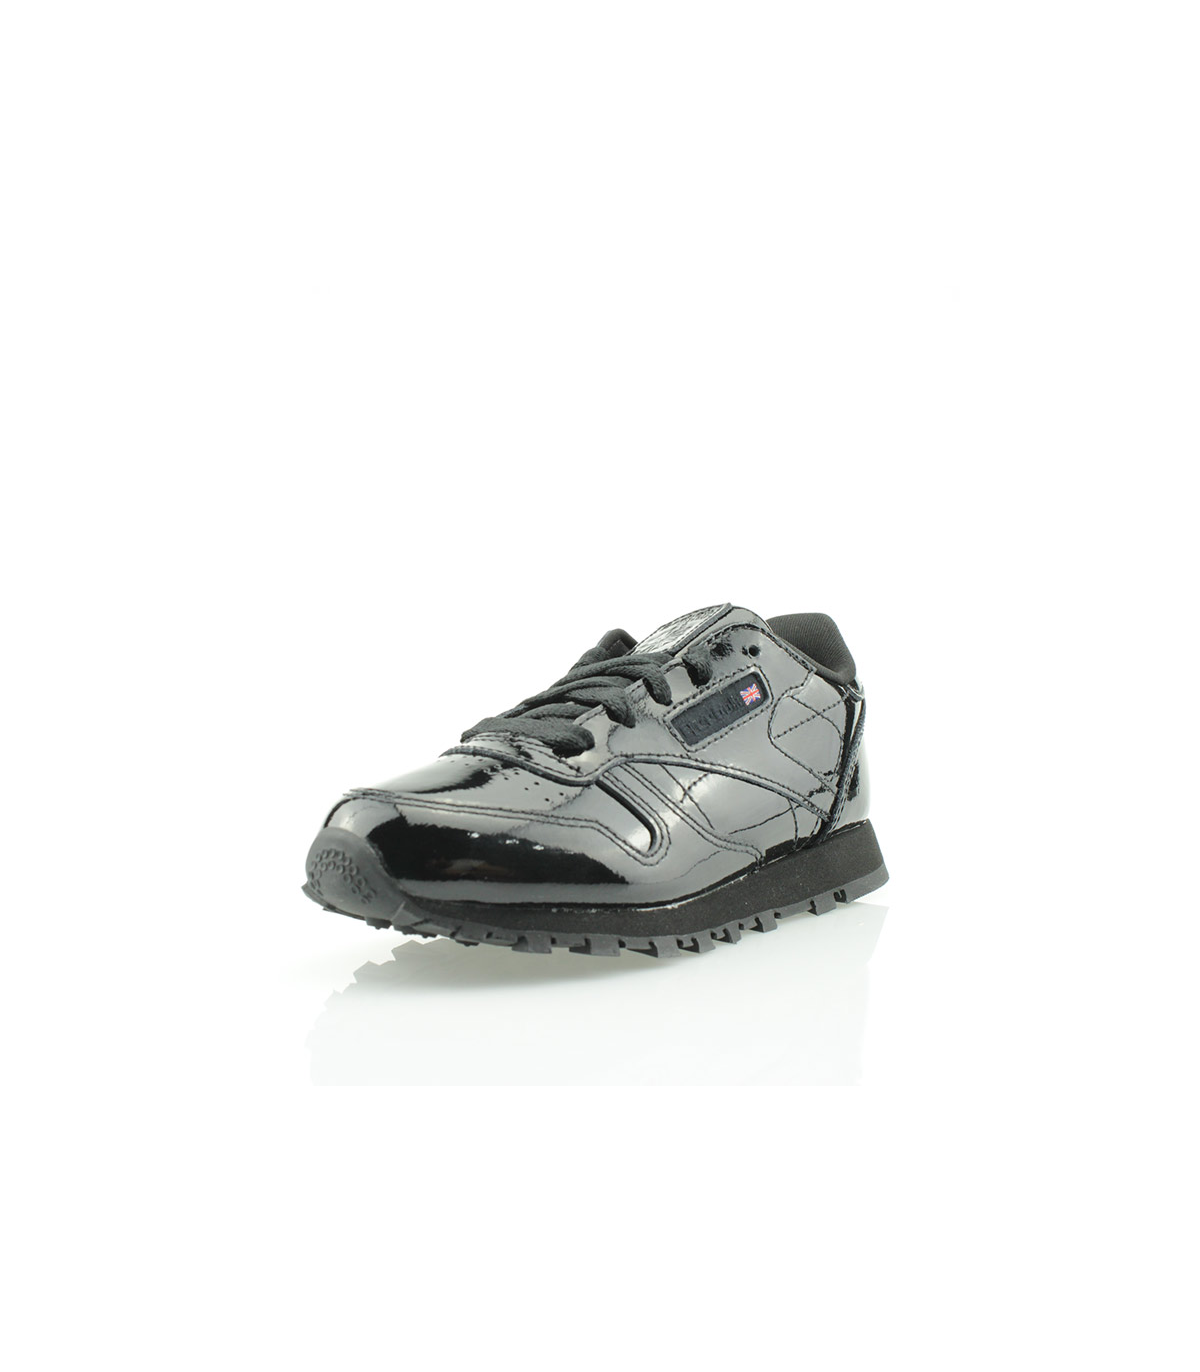 546e55086d8 Buy Reebok Classic Leather Patent Black